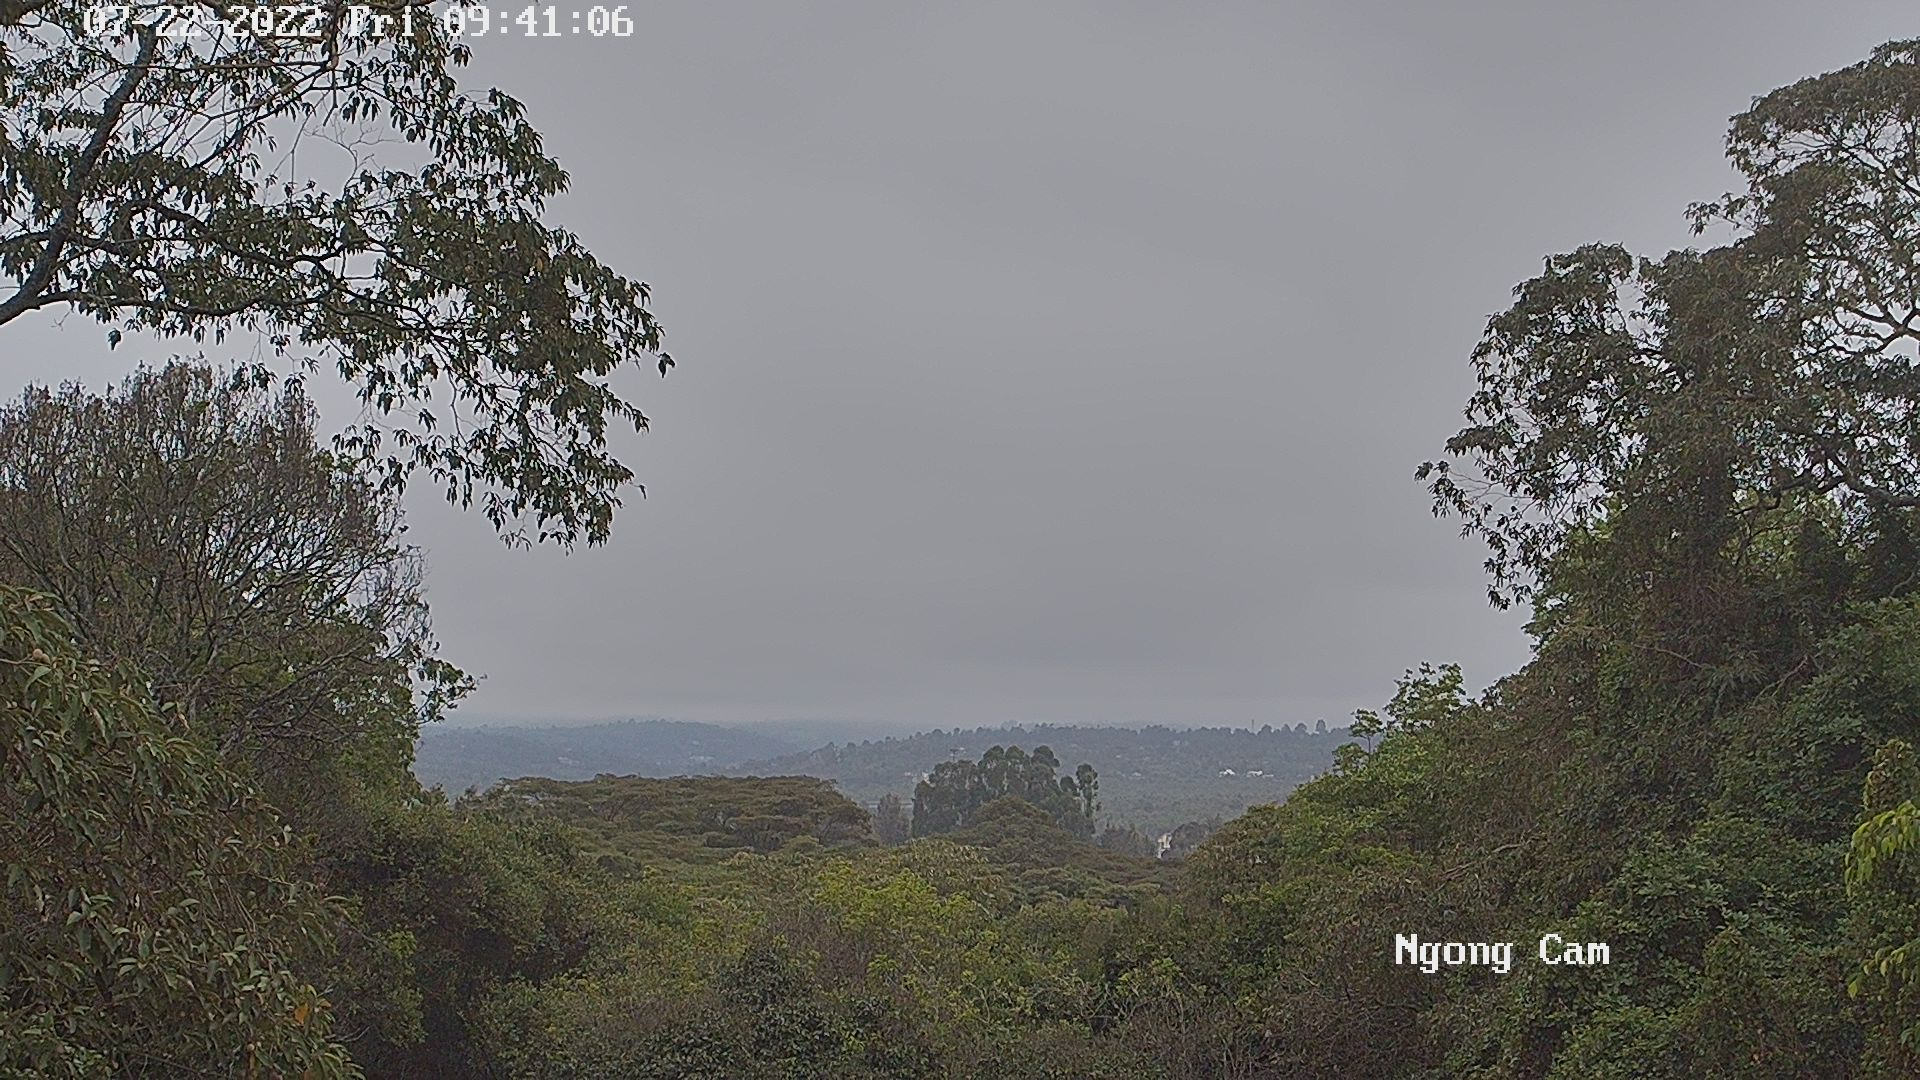 Kilimanjaro Webcam Kenya